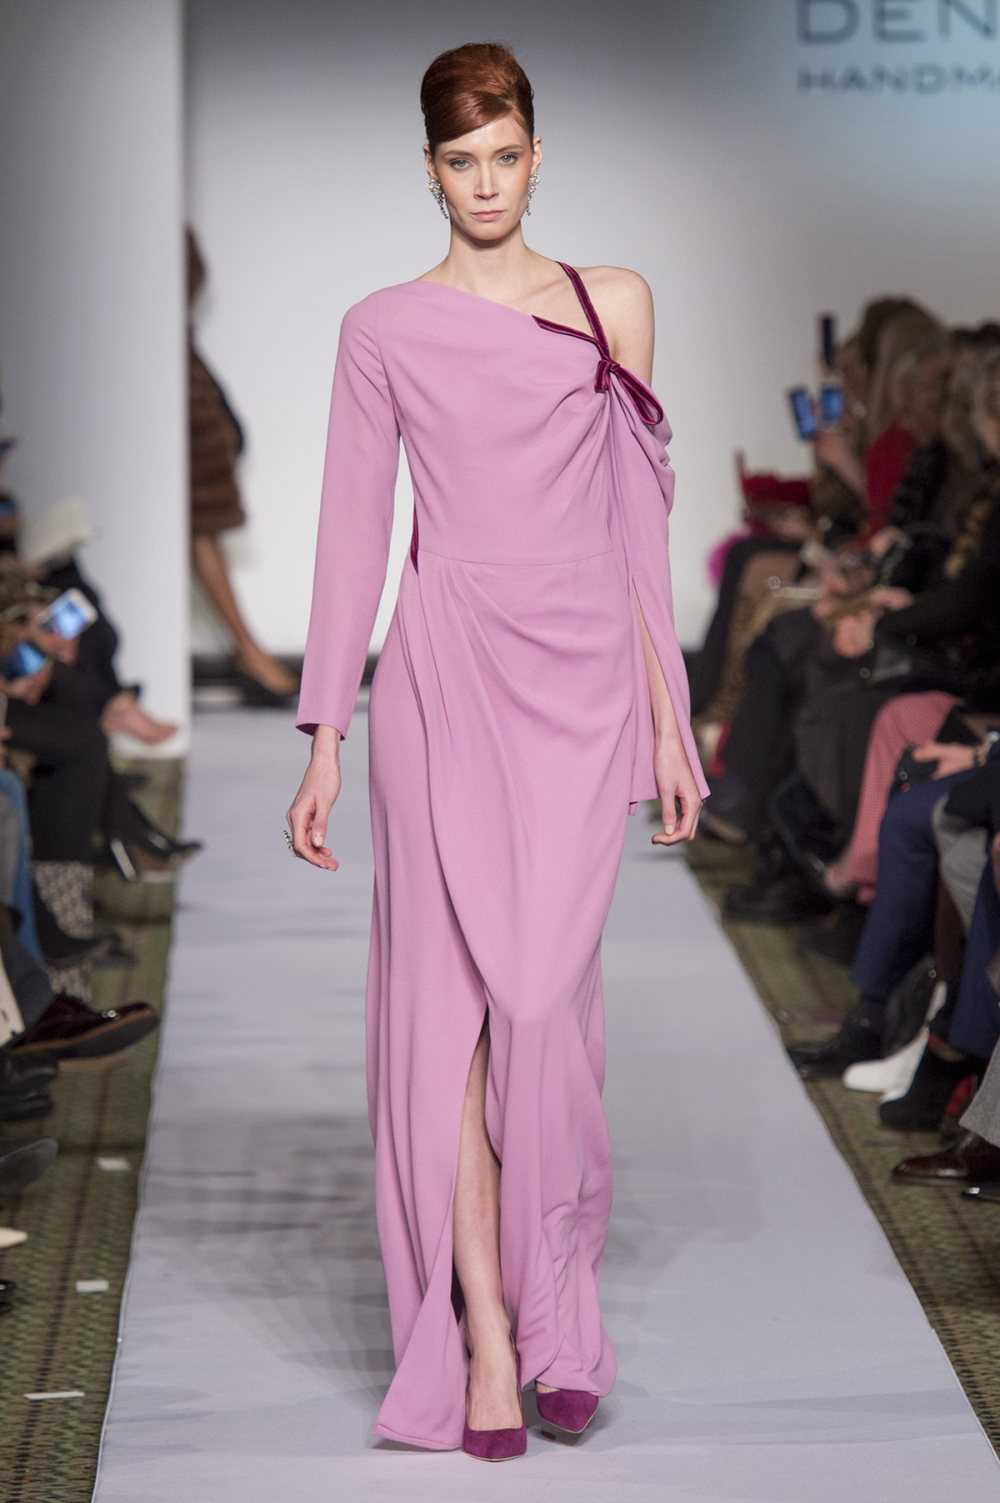 Carolina Herrera时装系列用鲜艳的颜色充满智能的黑白色调-30.jpg